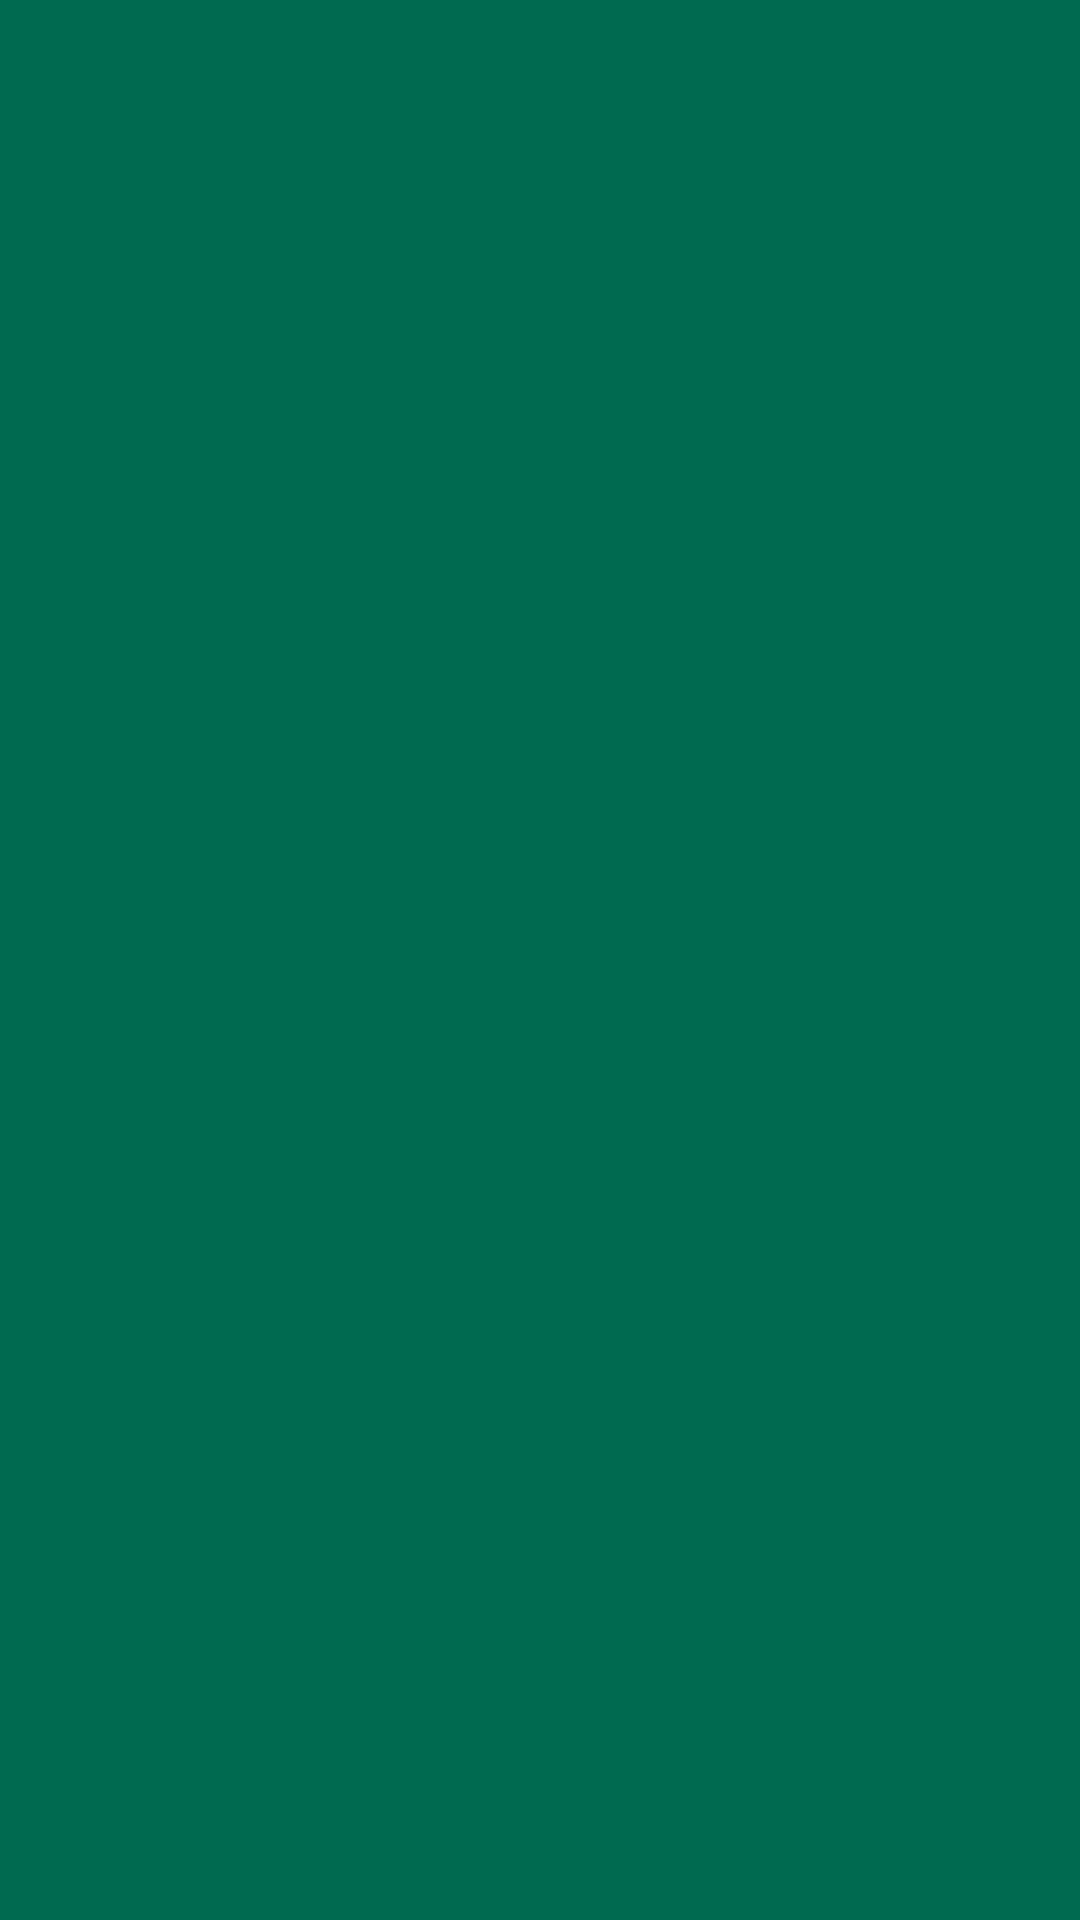 1080x1920 Bottle Green Solid Color Background